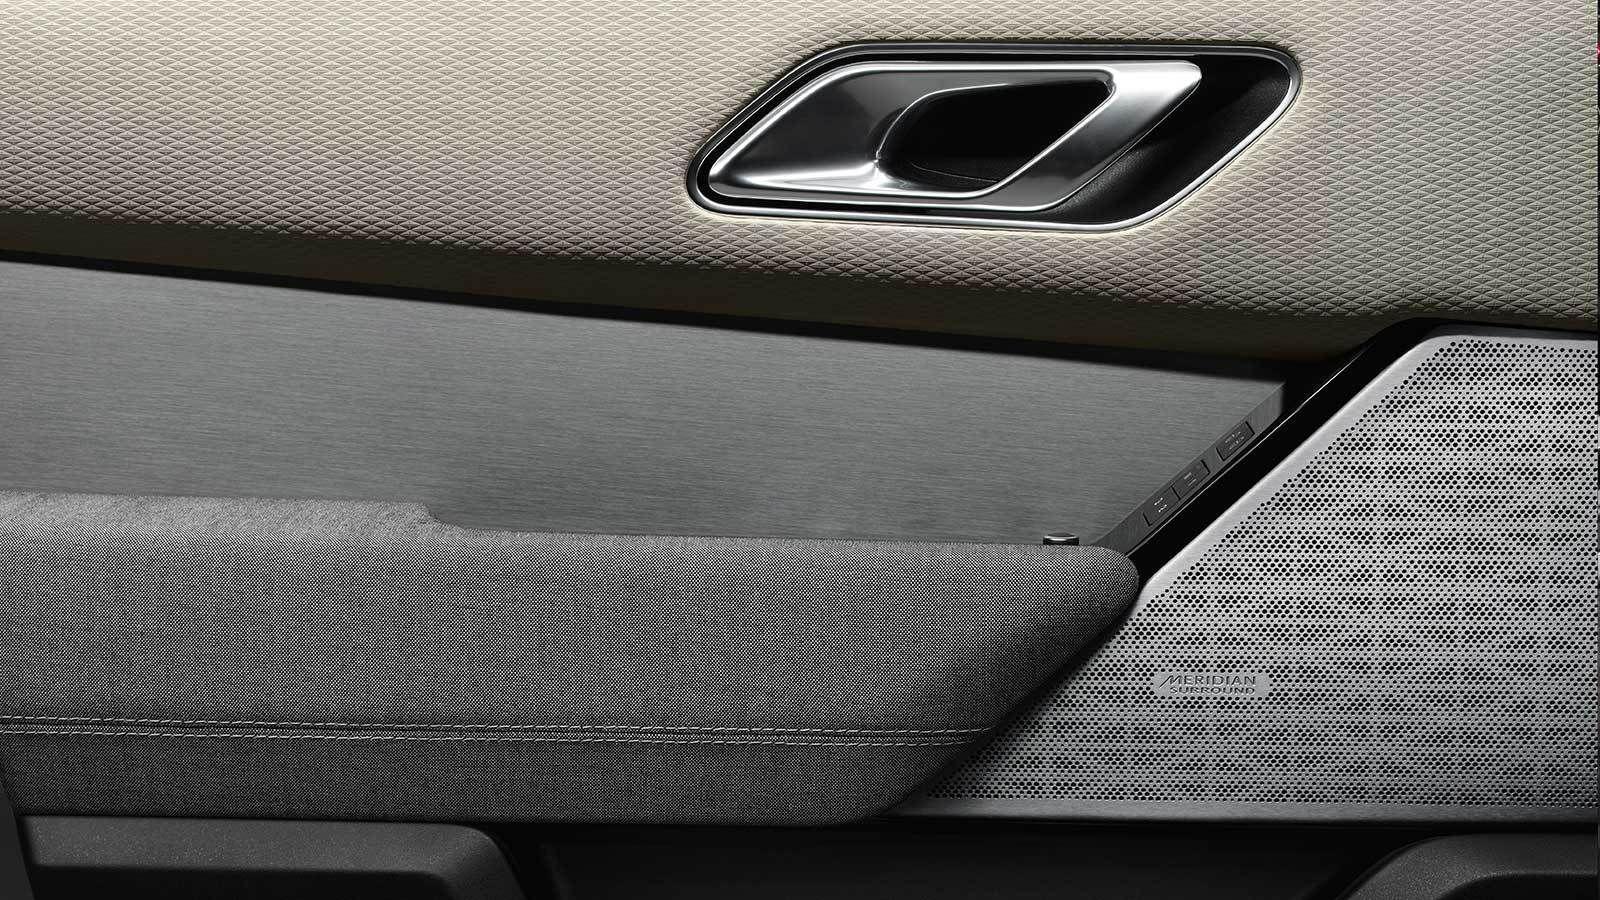 Range Rover Velar Accessories | Land Rover Oman